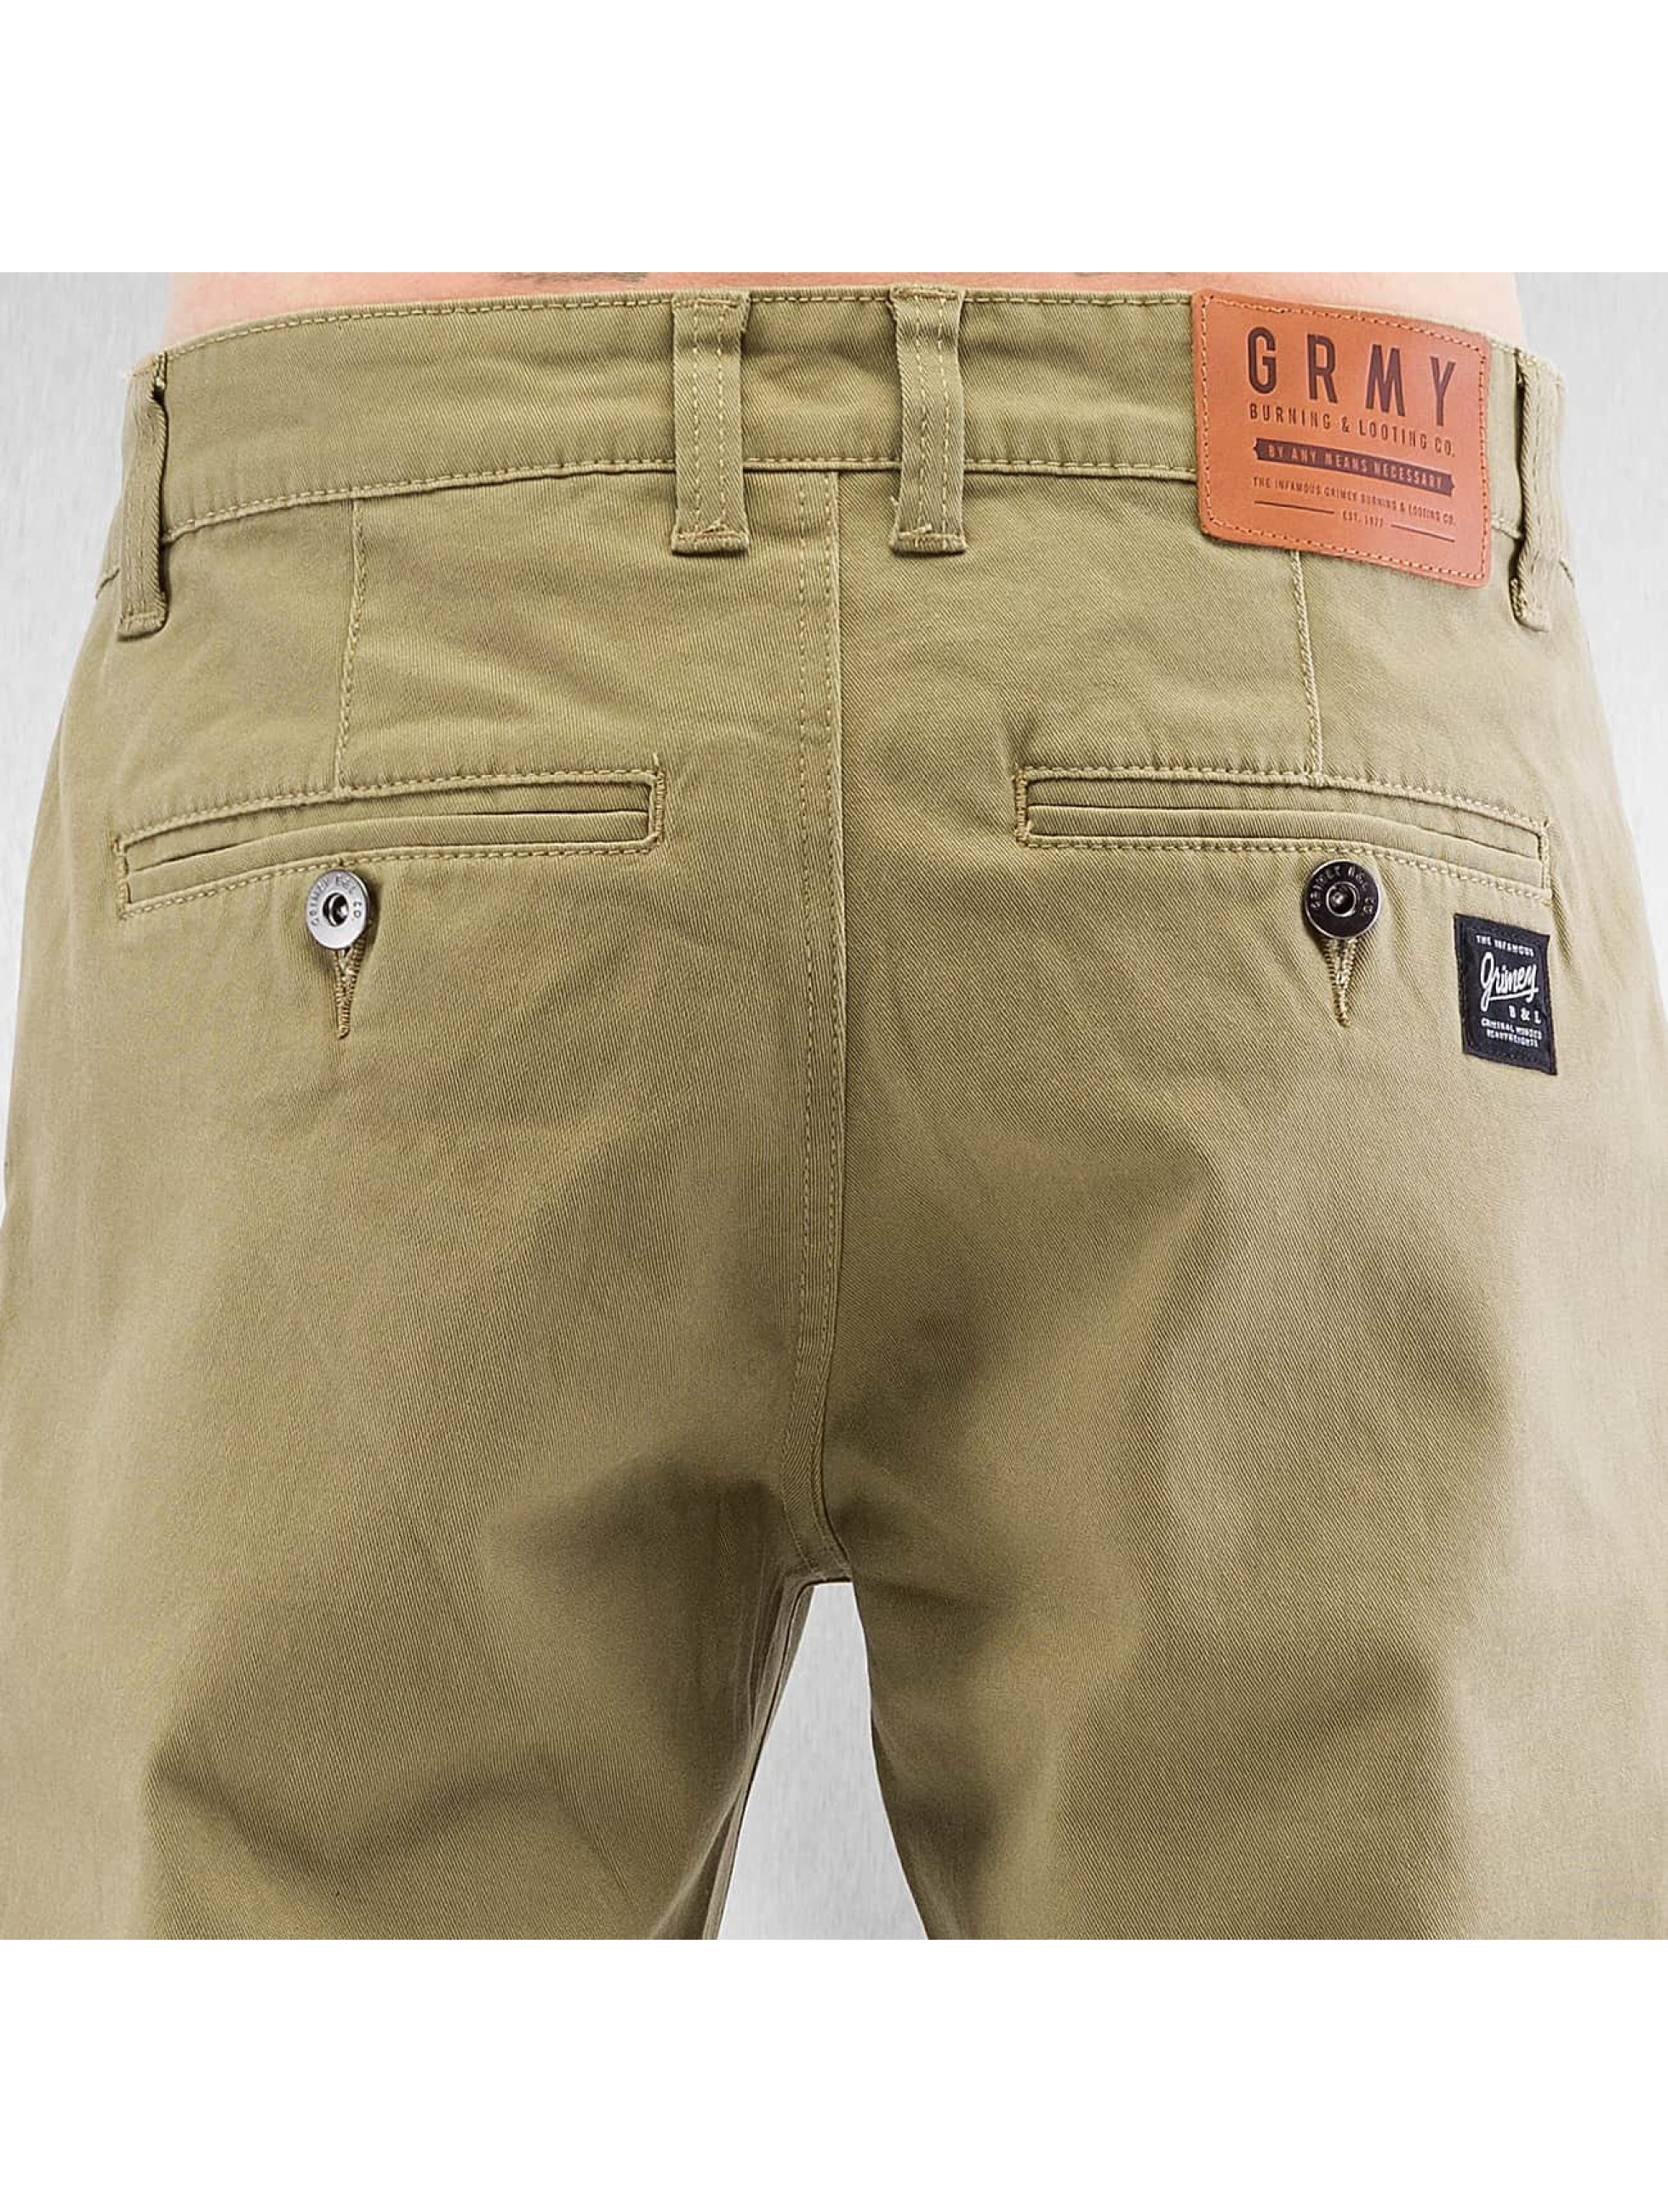 Grimey Wear joggingbroek Twill Peach beige